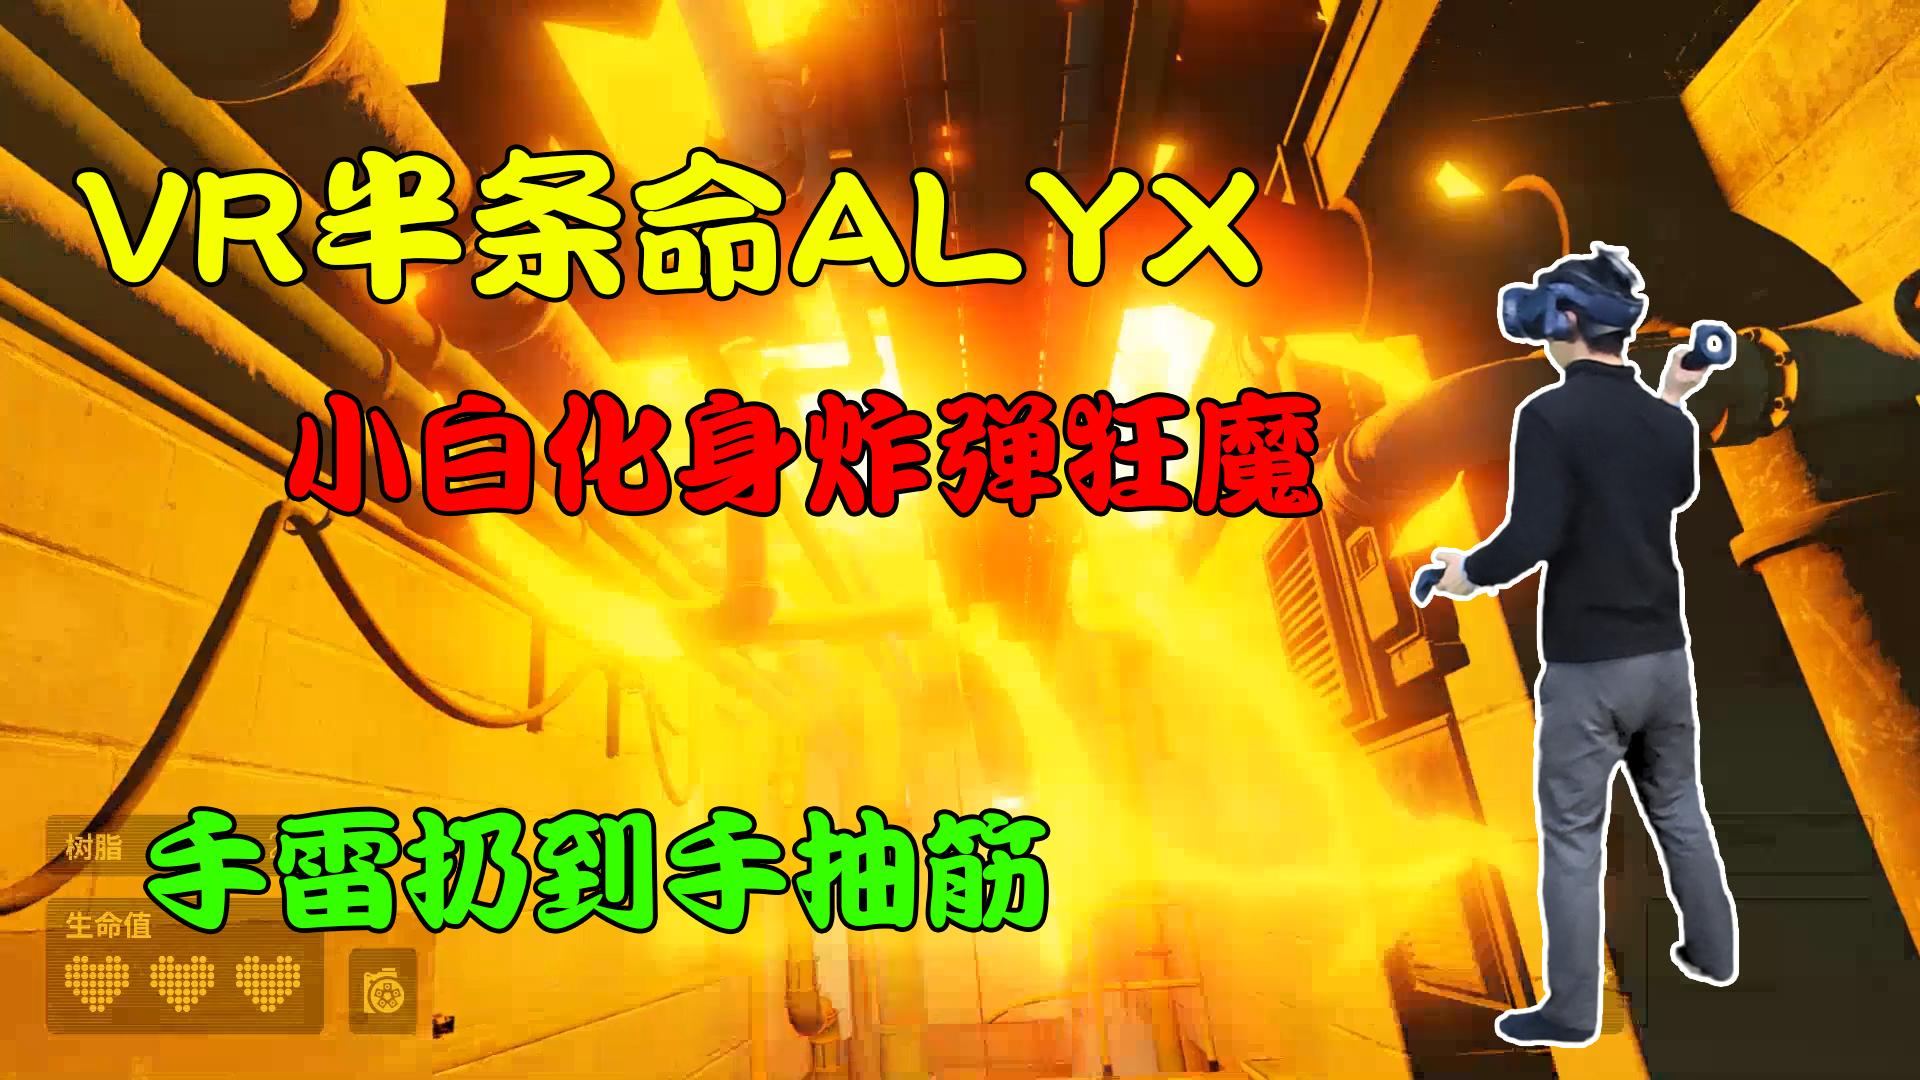 VR半条命alyx:重火力小白上线,手雷扔上瘾到处狂轰滥炸!